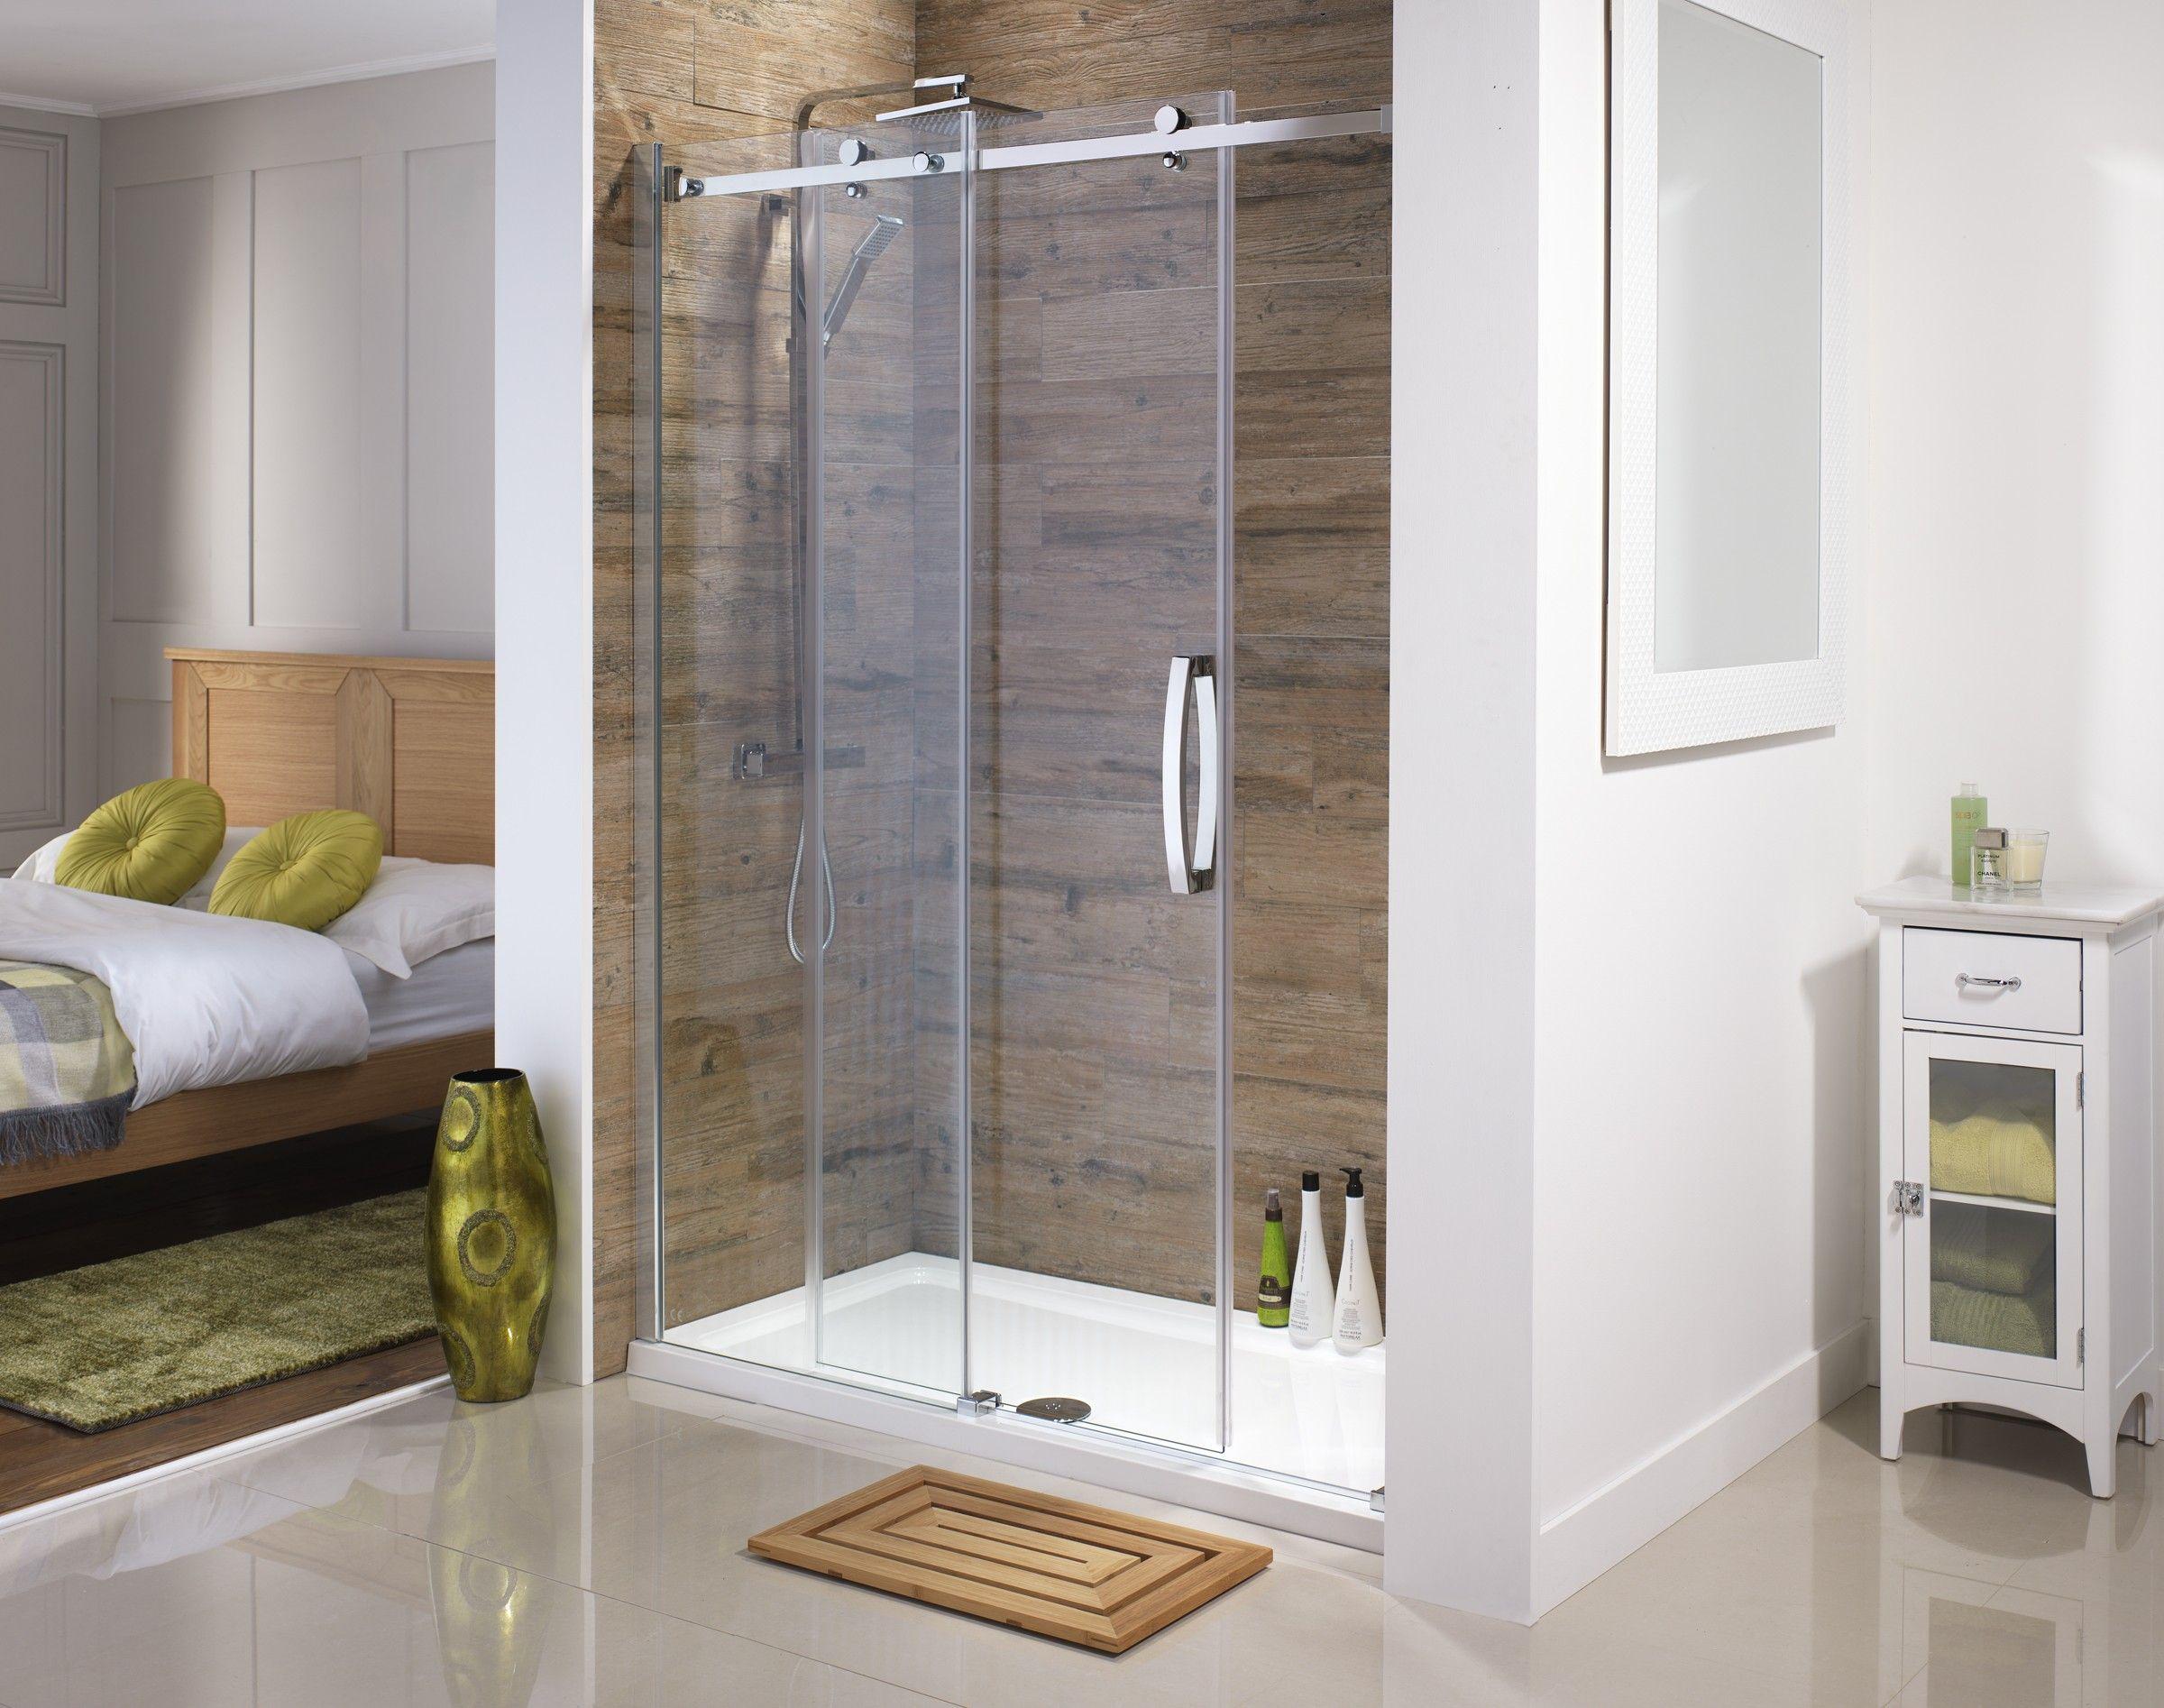 Orca Frameless Sliding Doors Available From Serene Bathrooms